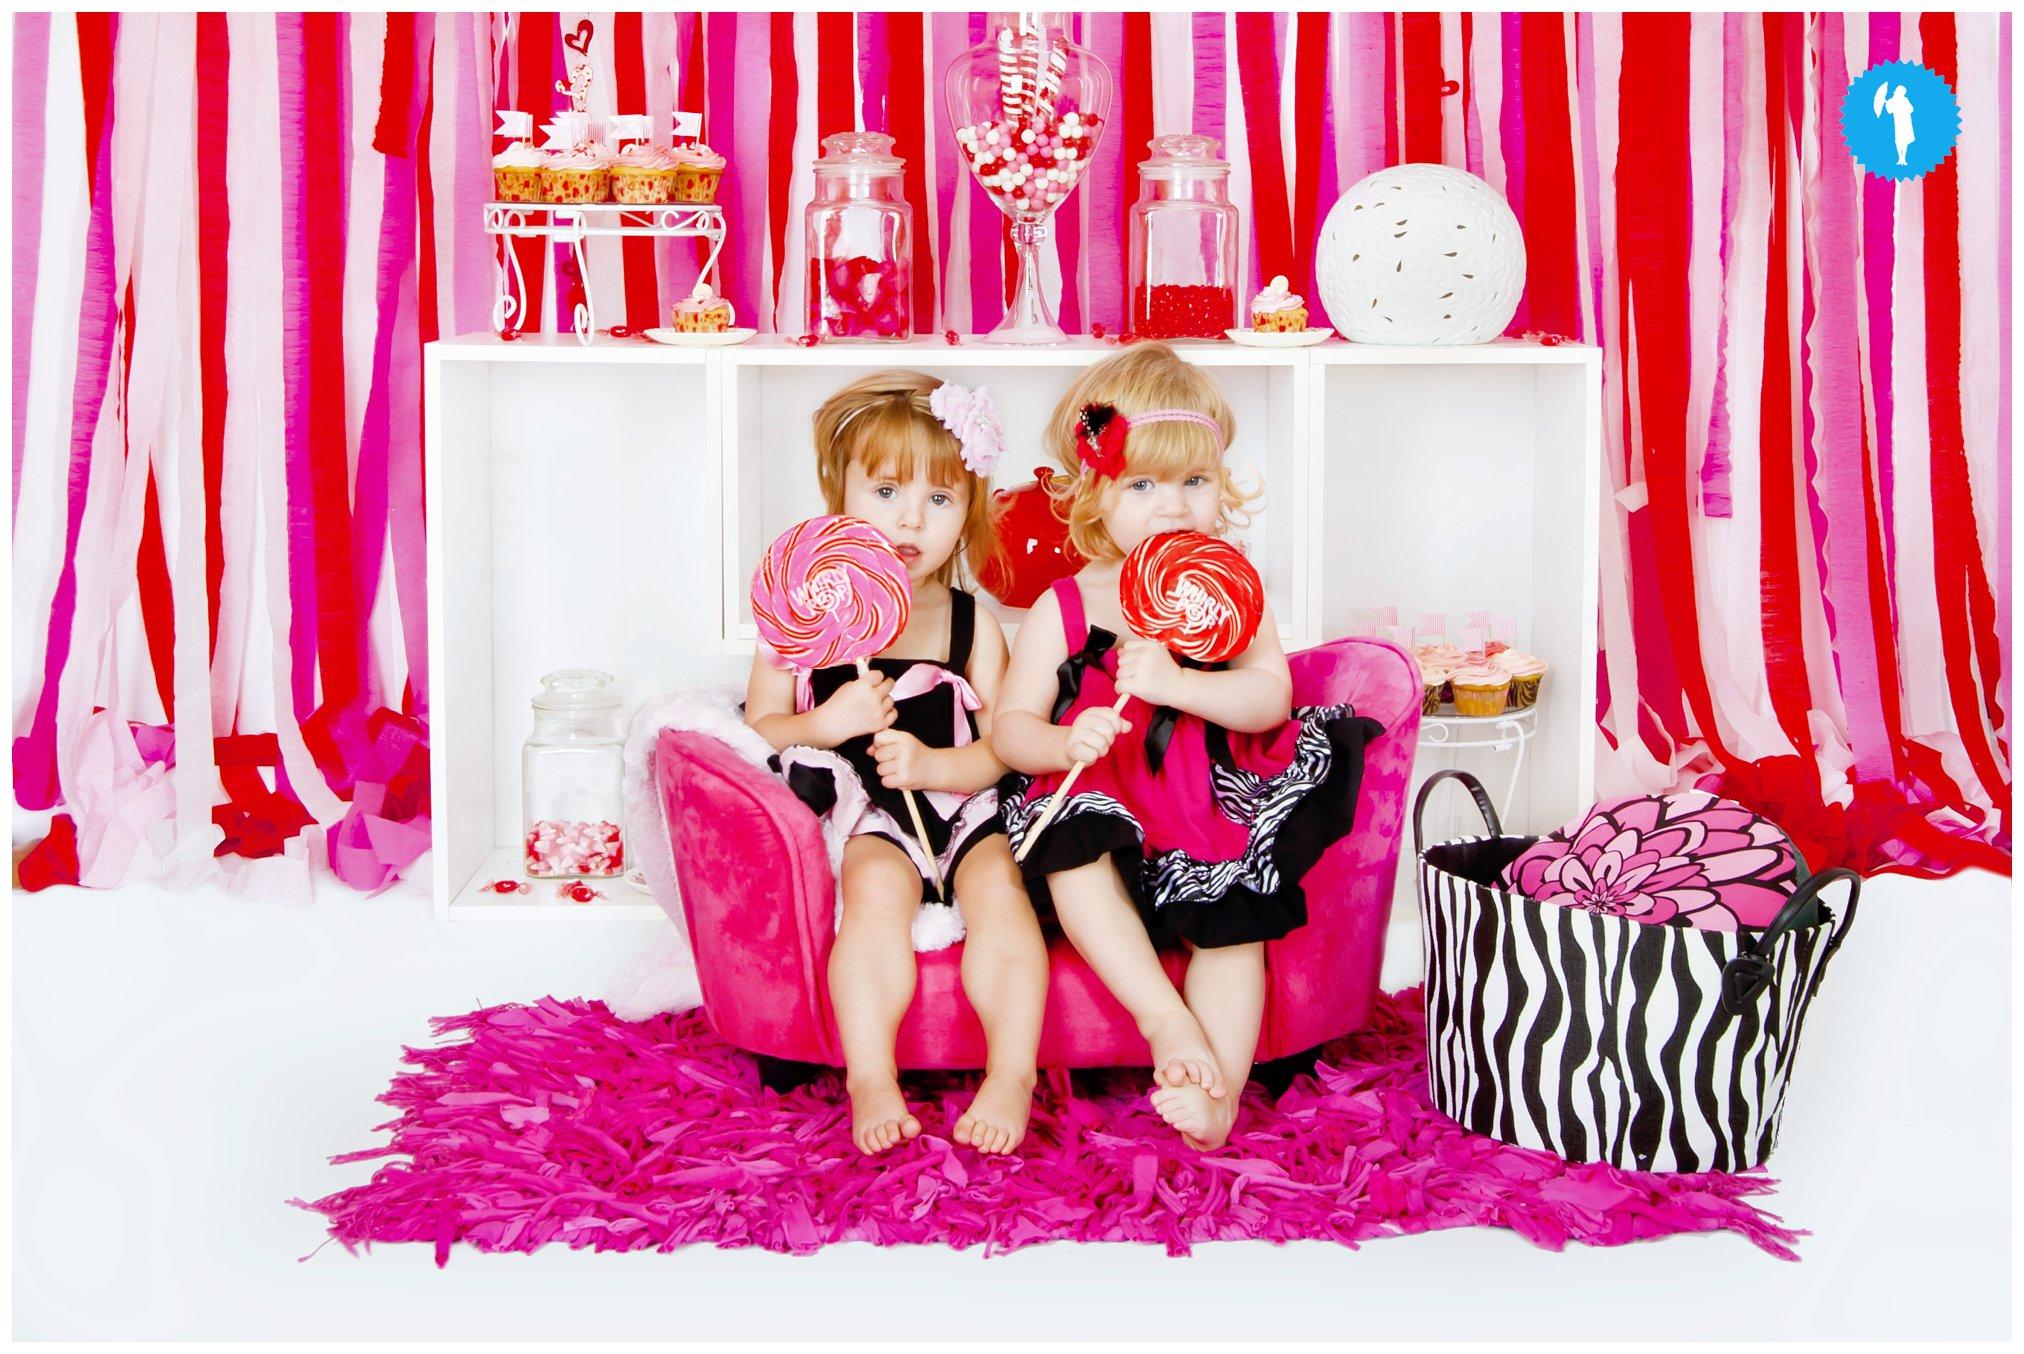 Valentine's photos in Kitchener by Emily Beatty.